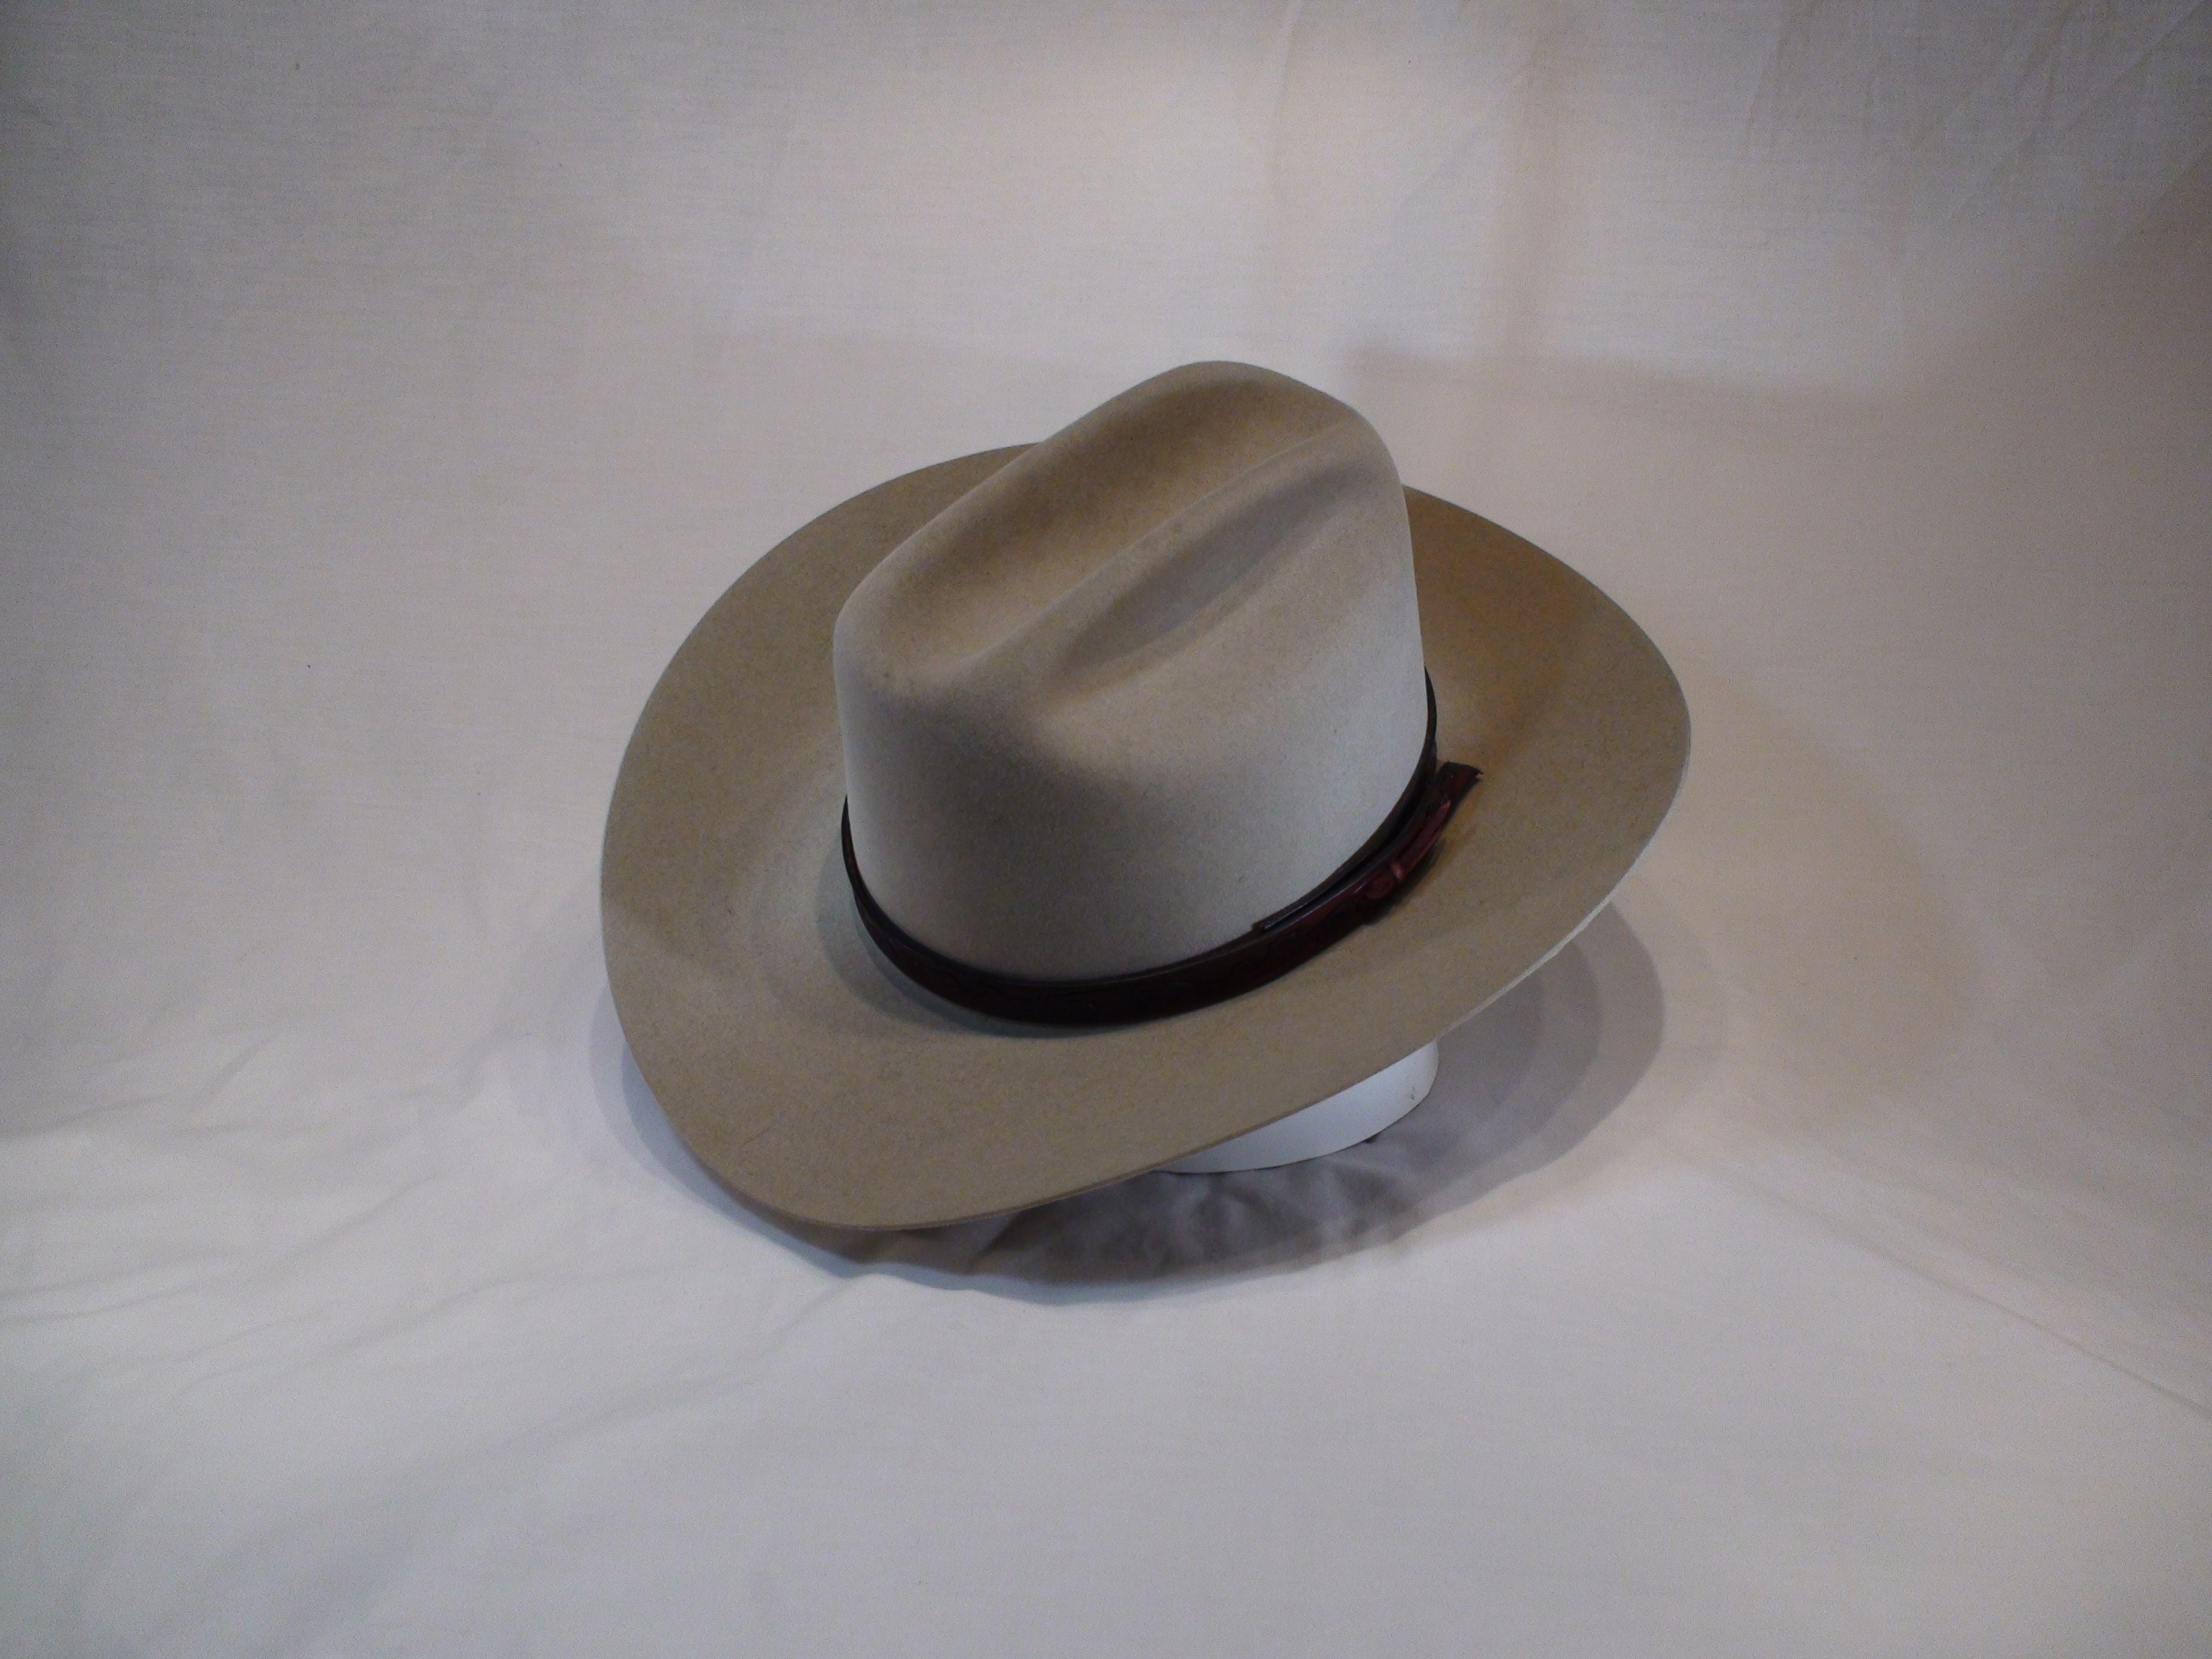 Stetson Cowboy Hats 4x Beaver c9115bbfcc3